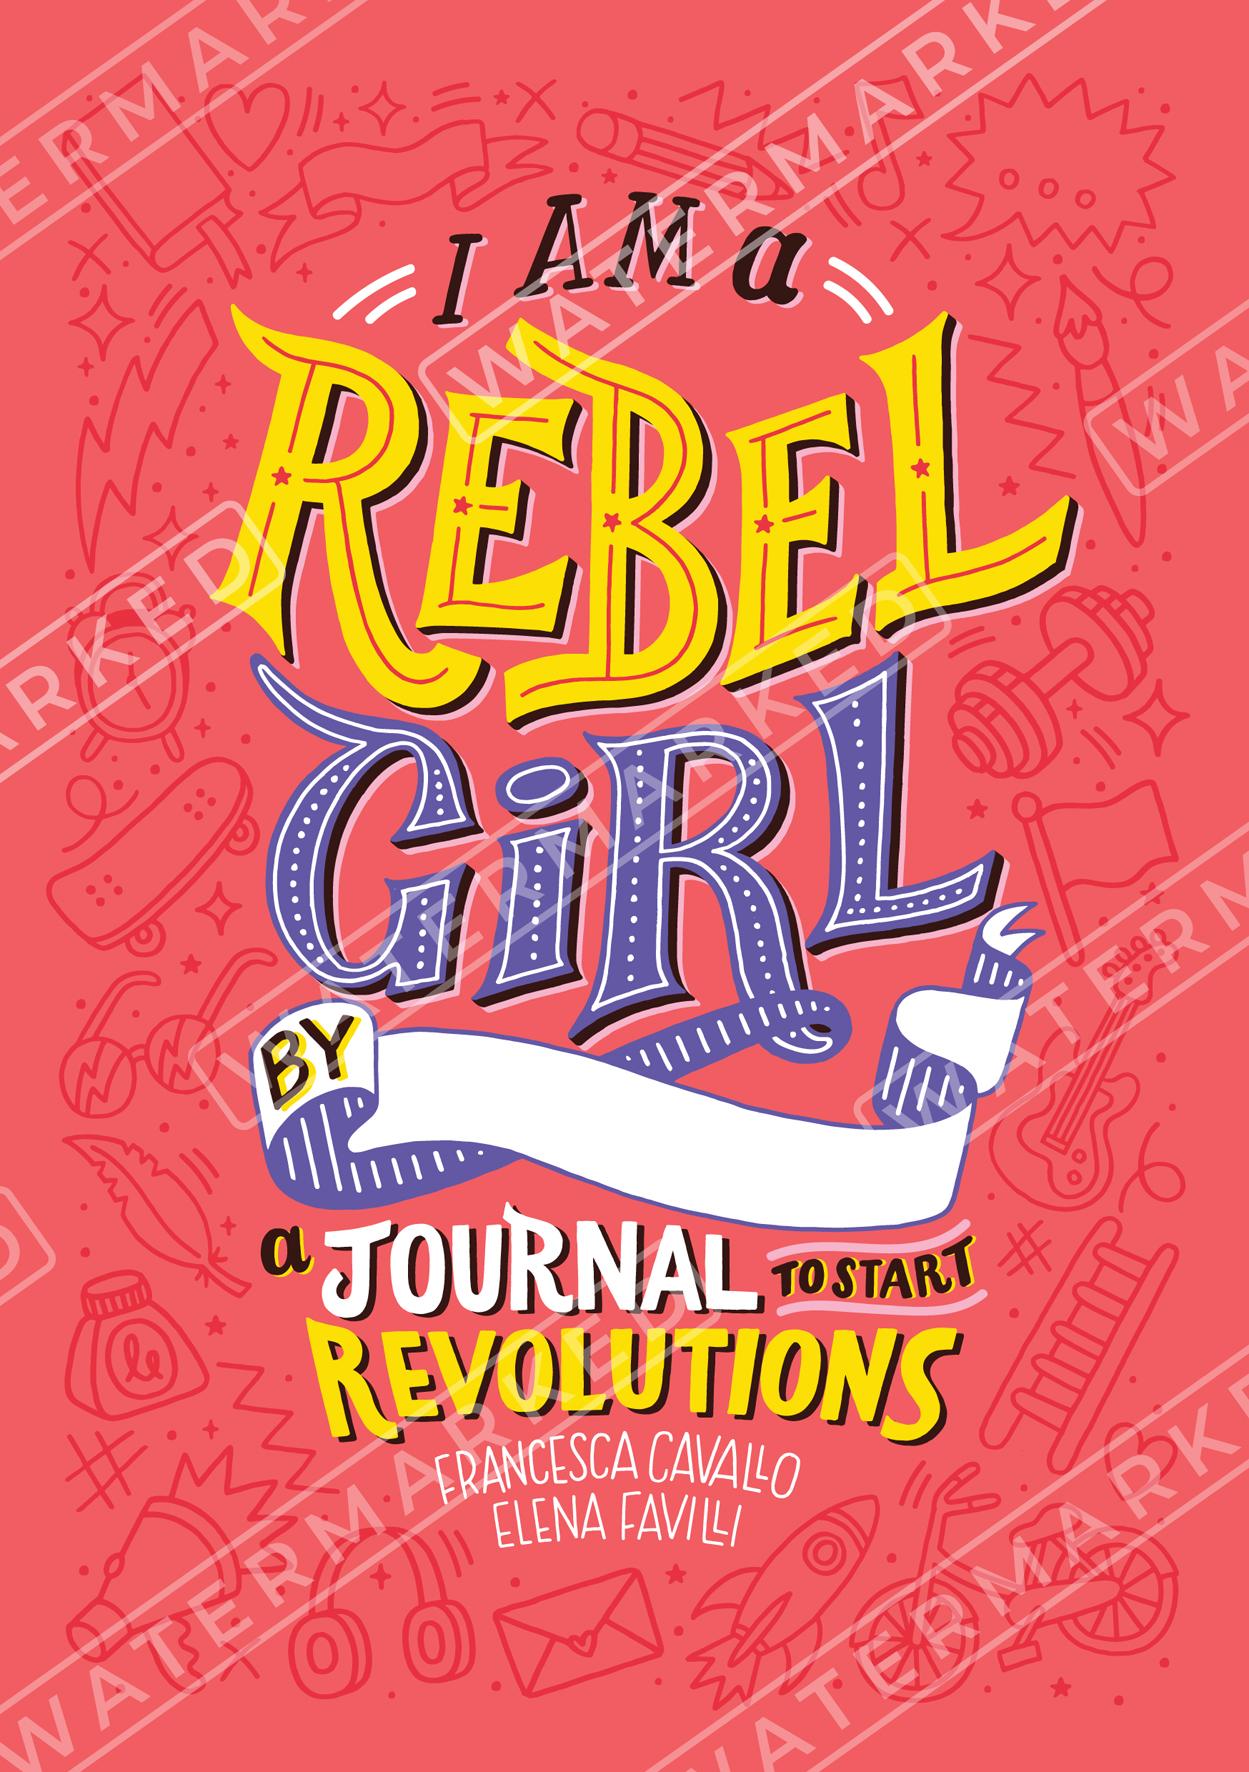 I am a Rebel Girl - A Journal To Start Revolutions - Francesca Cavallo + Elena Favilli